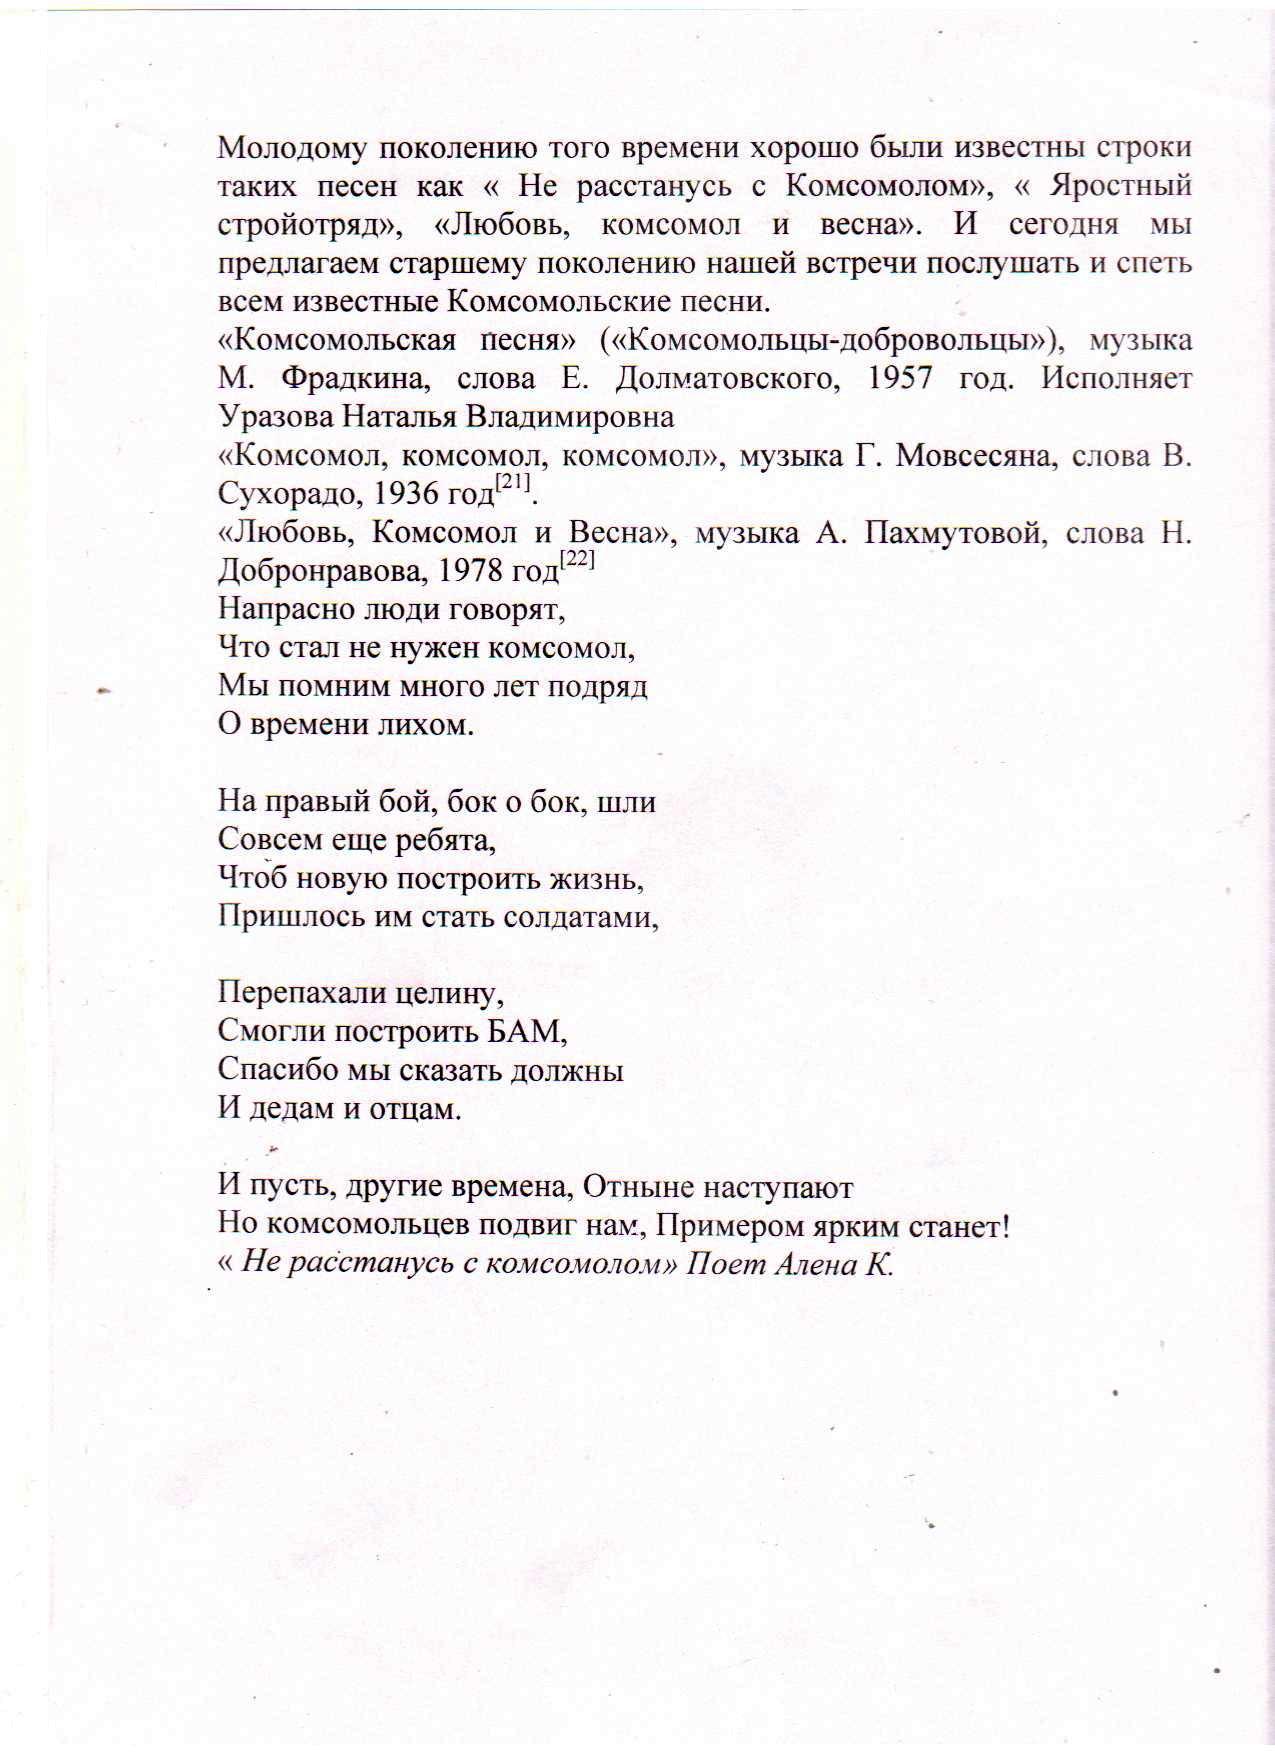 C:\Users\Юля\Desktop\комсомол и казаки 22\6.jpg